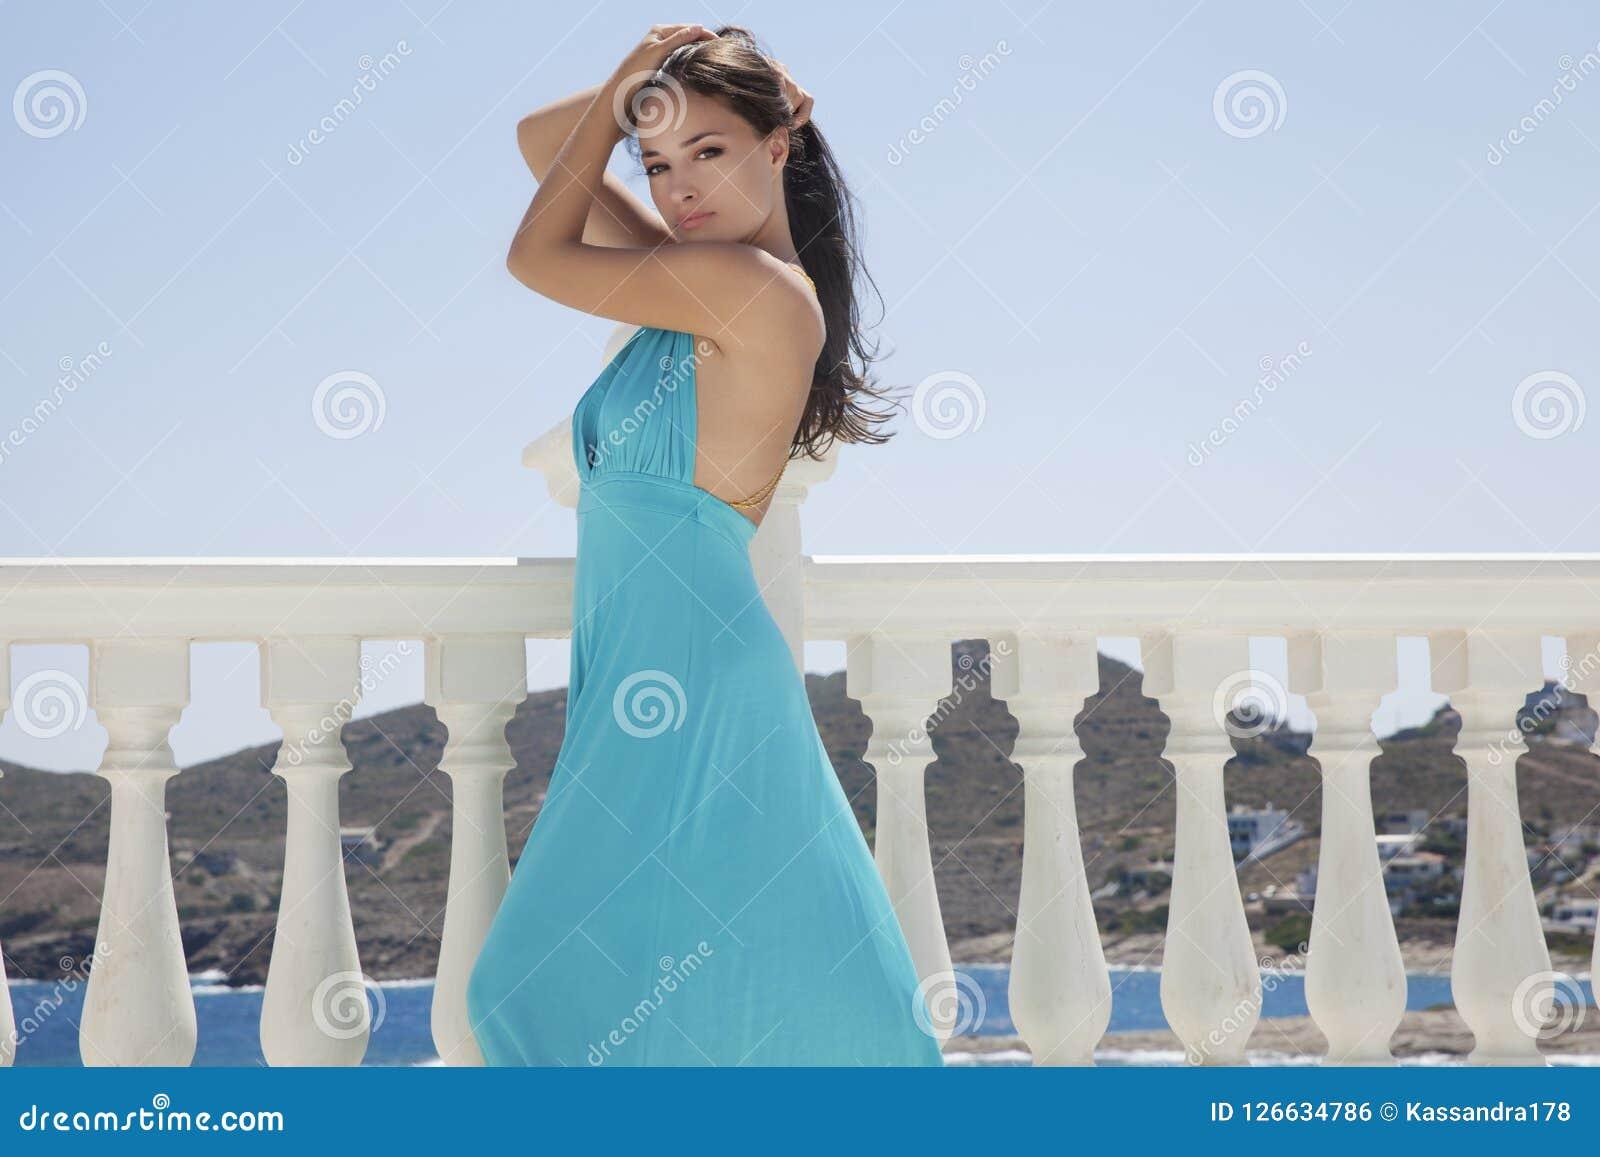 Robe bleue et mer bleue